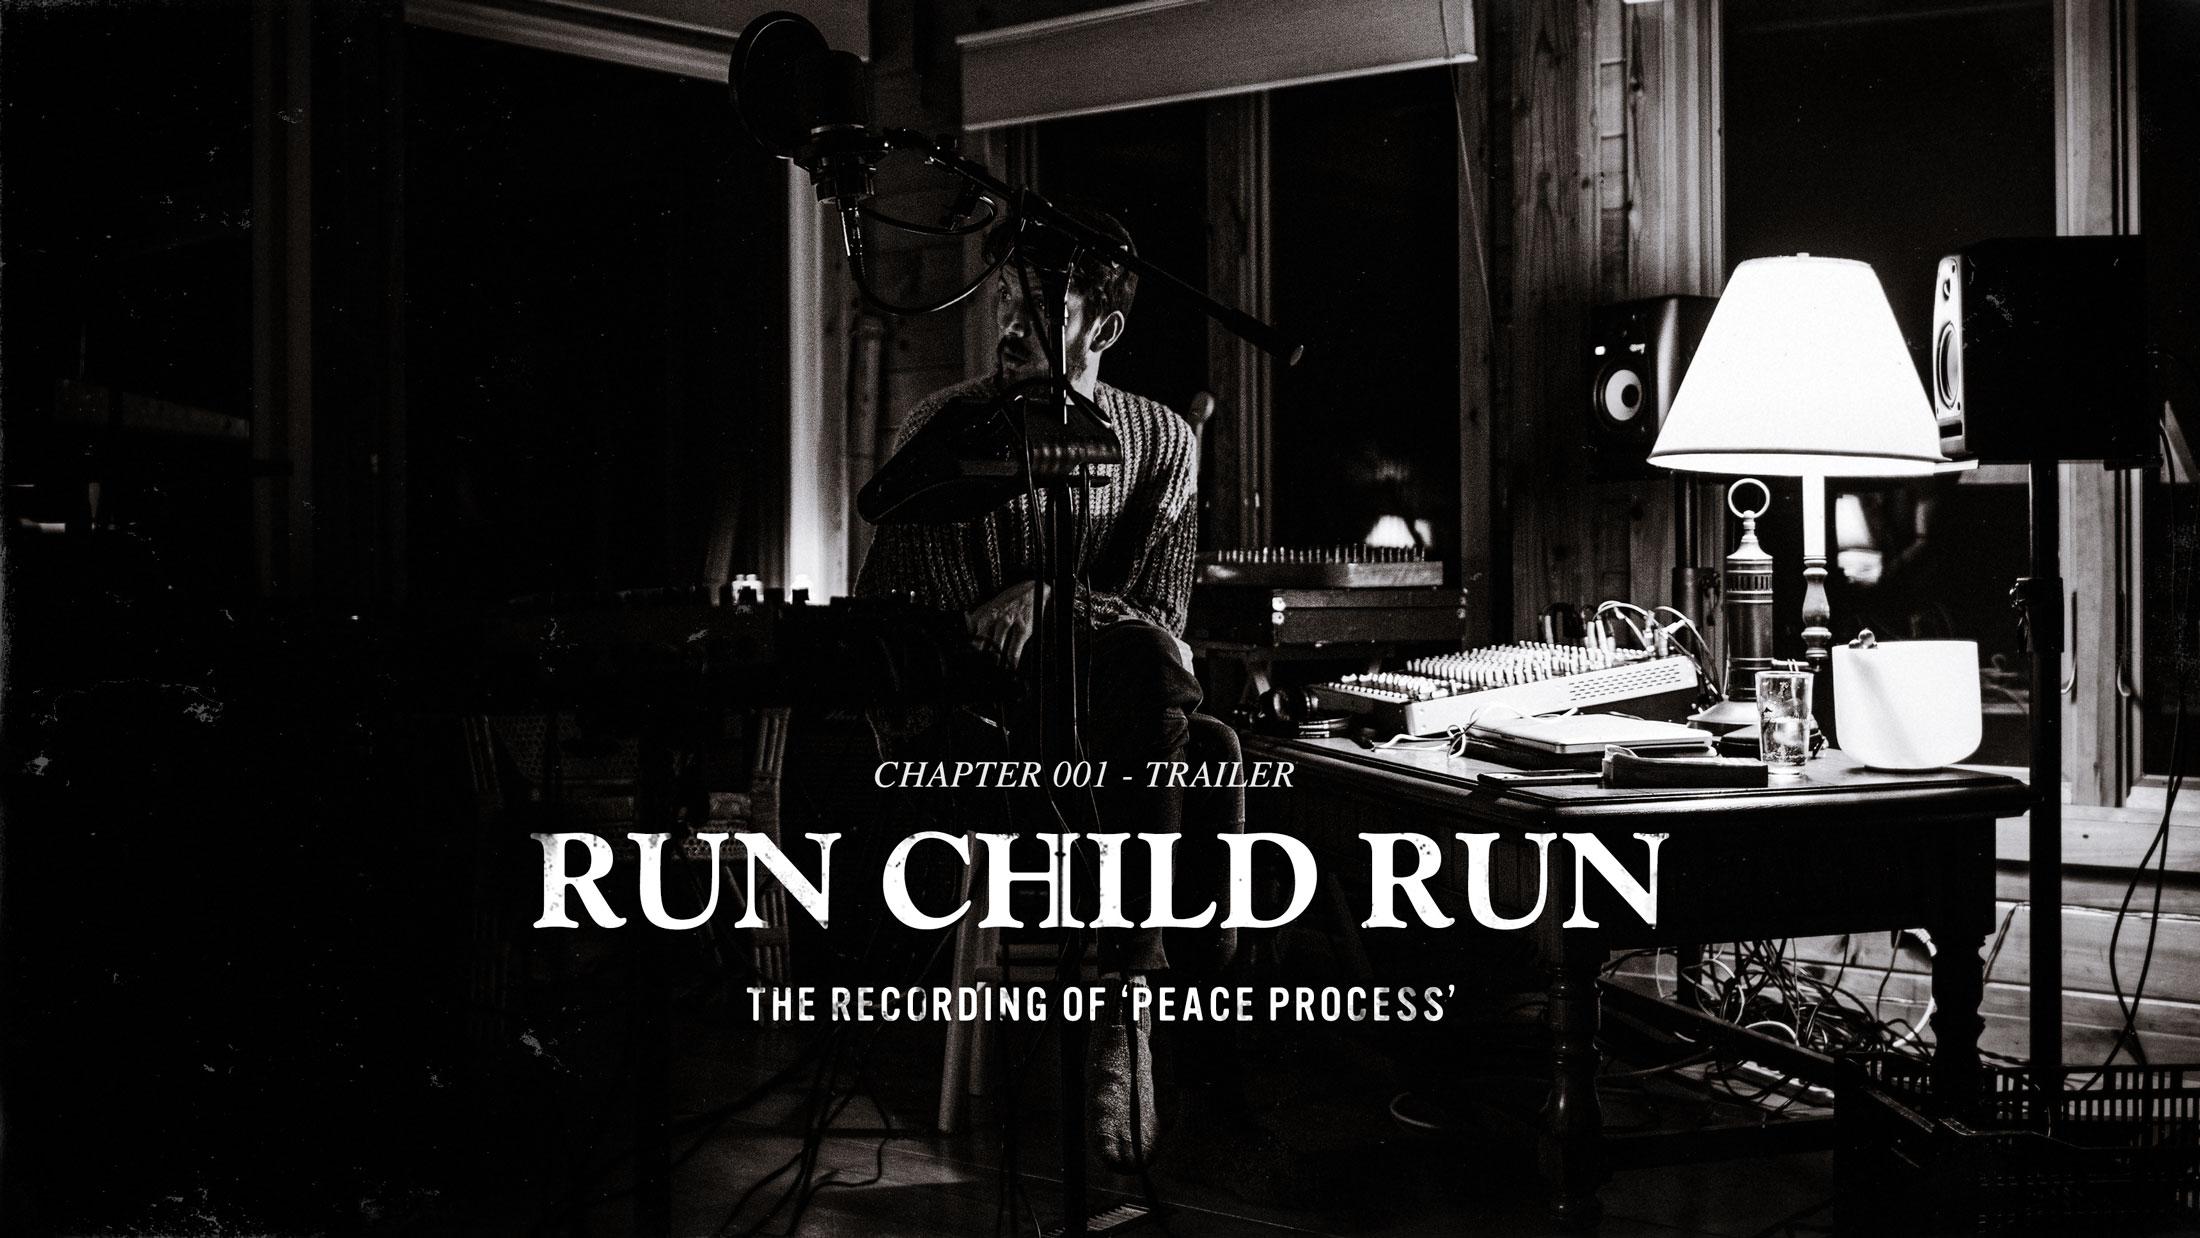 Run Child Run - The Recording of Peace Process